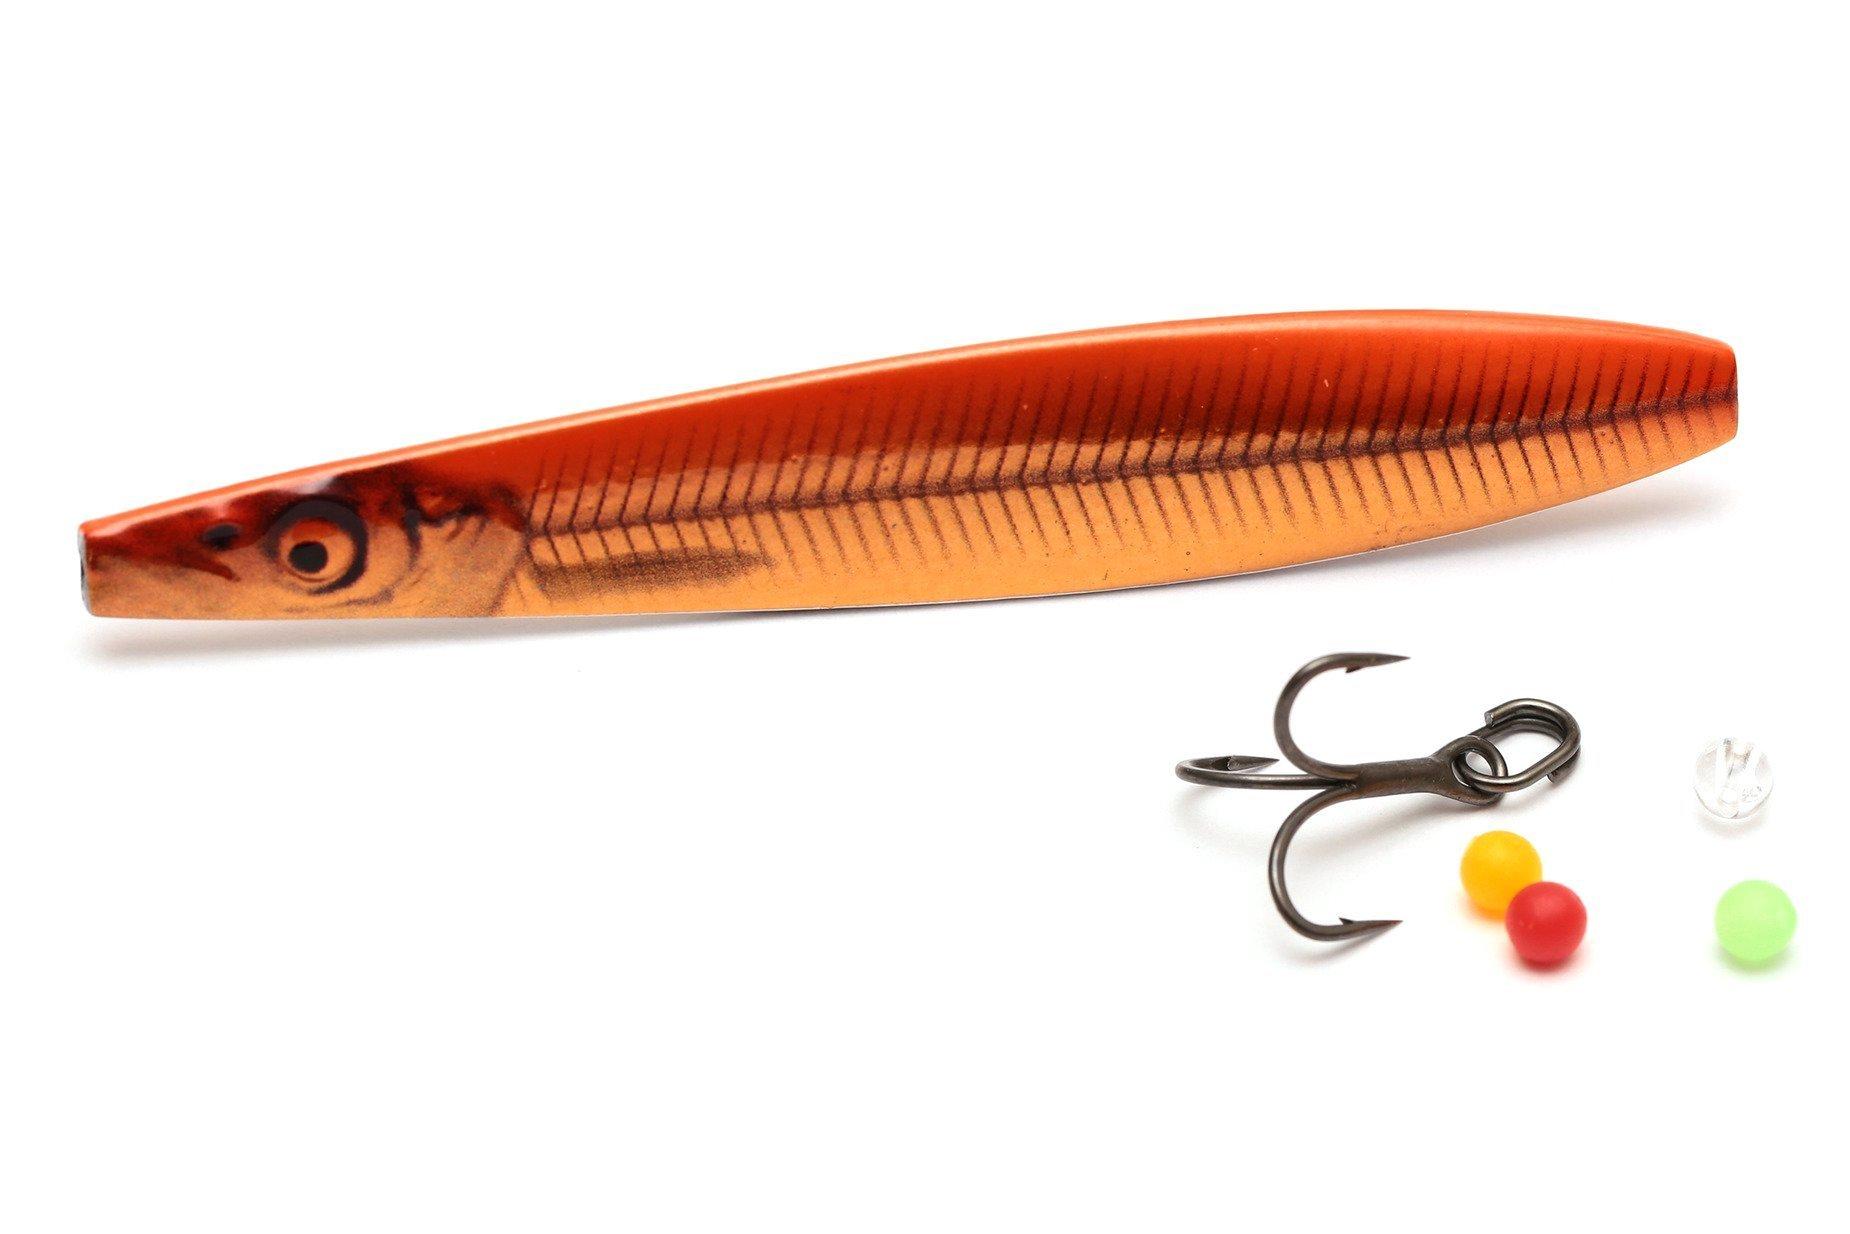 Savage Gear Lt Seeker - Red Copper 7.0cm 13g